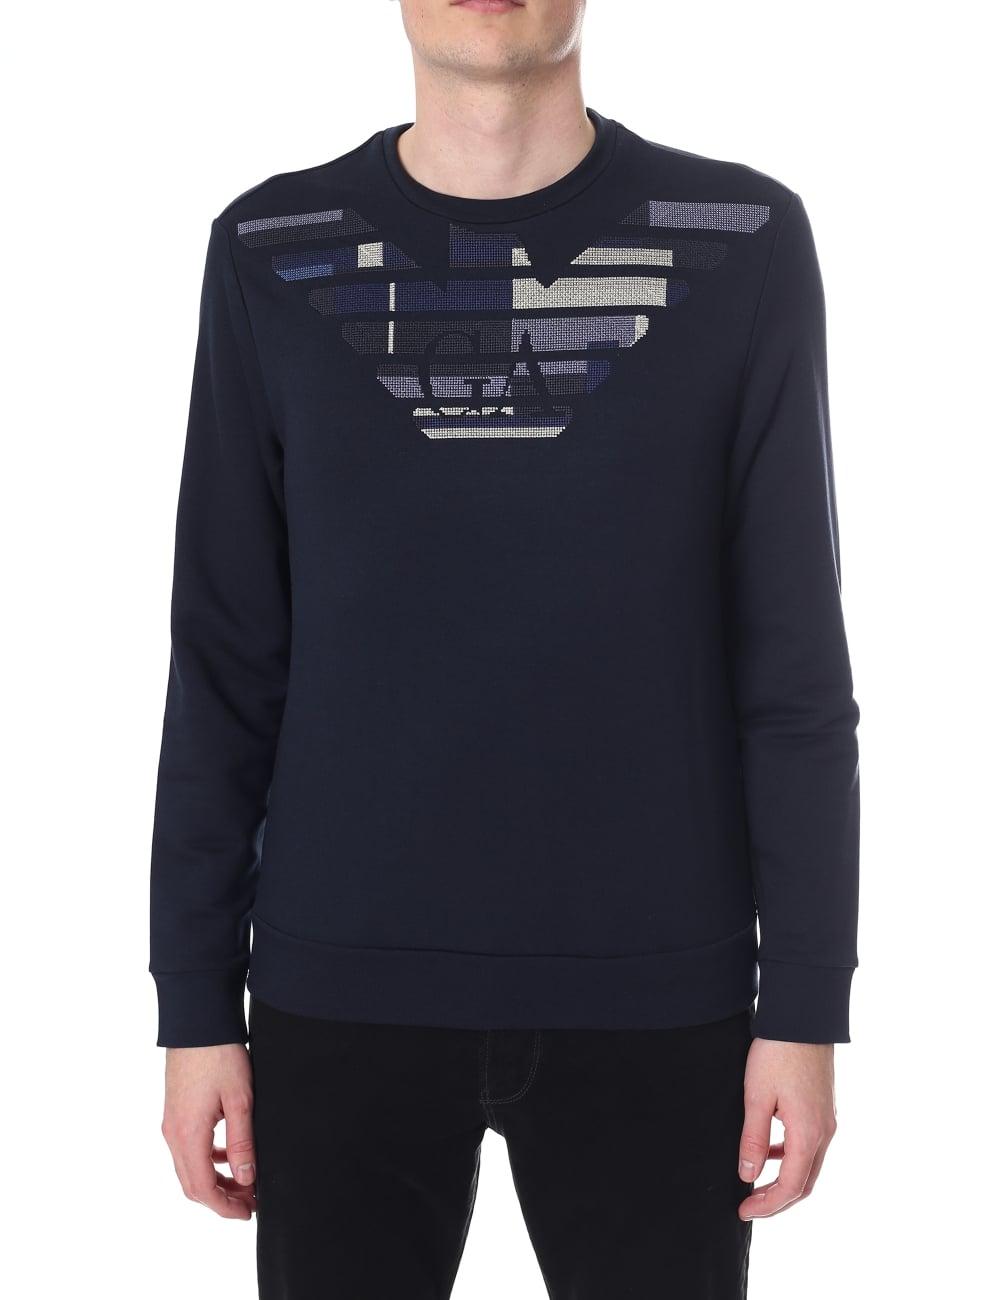 Armani Jeans Eagle Logo Crew Neck Sweat Top 4efc12dd67d2